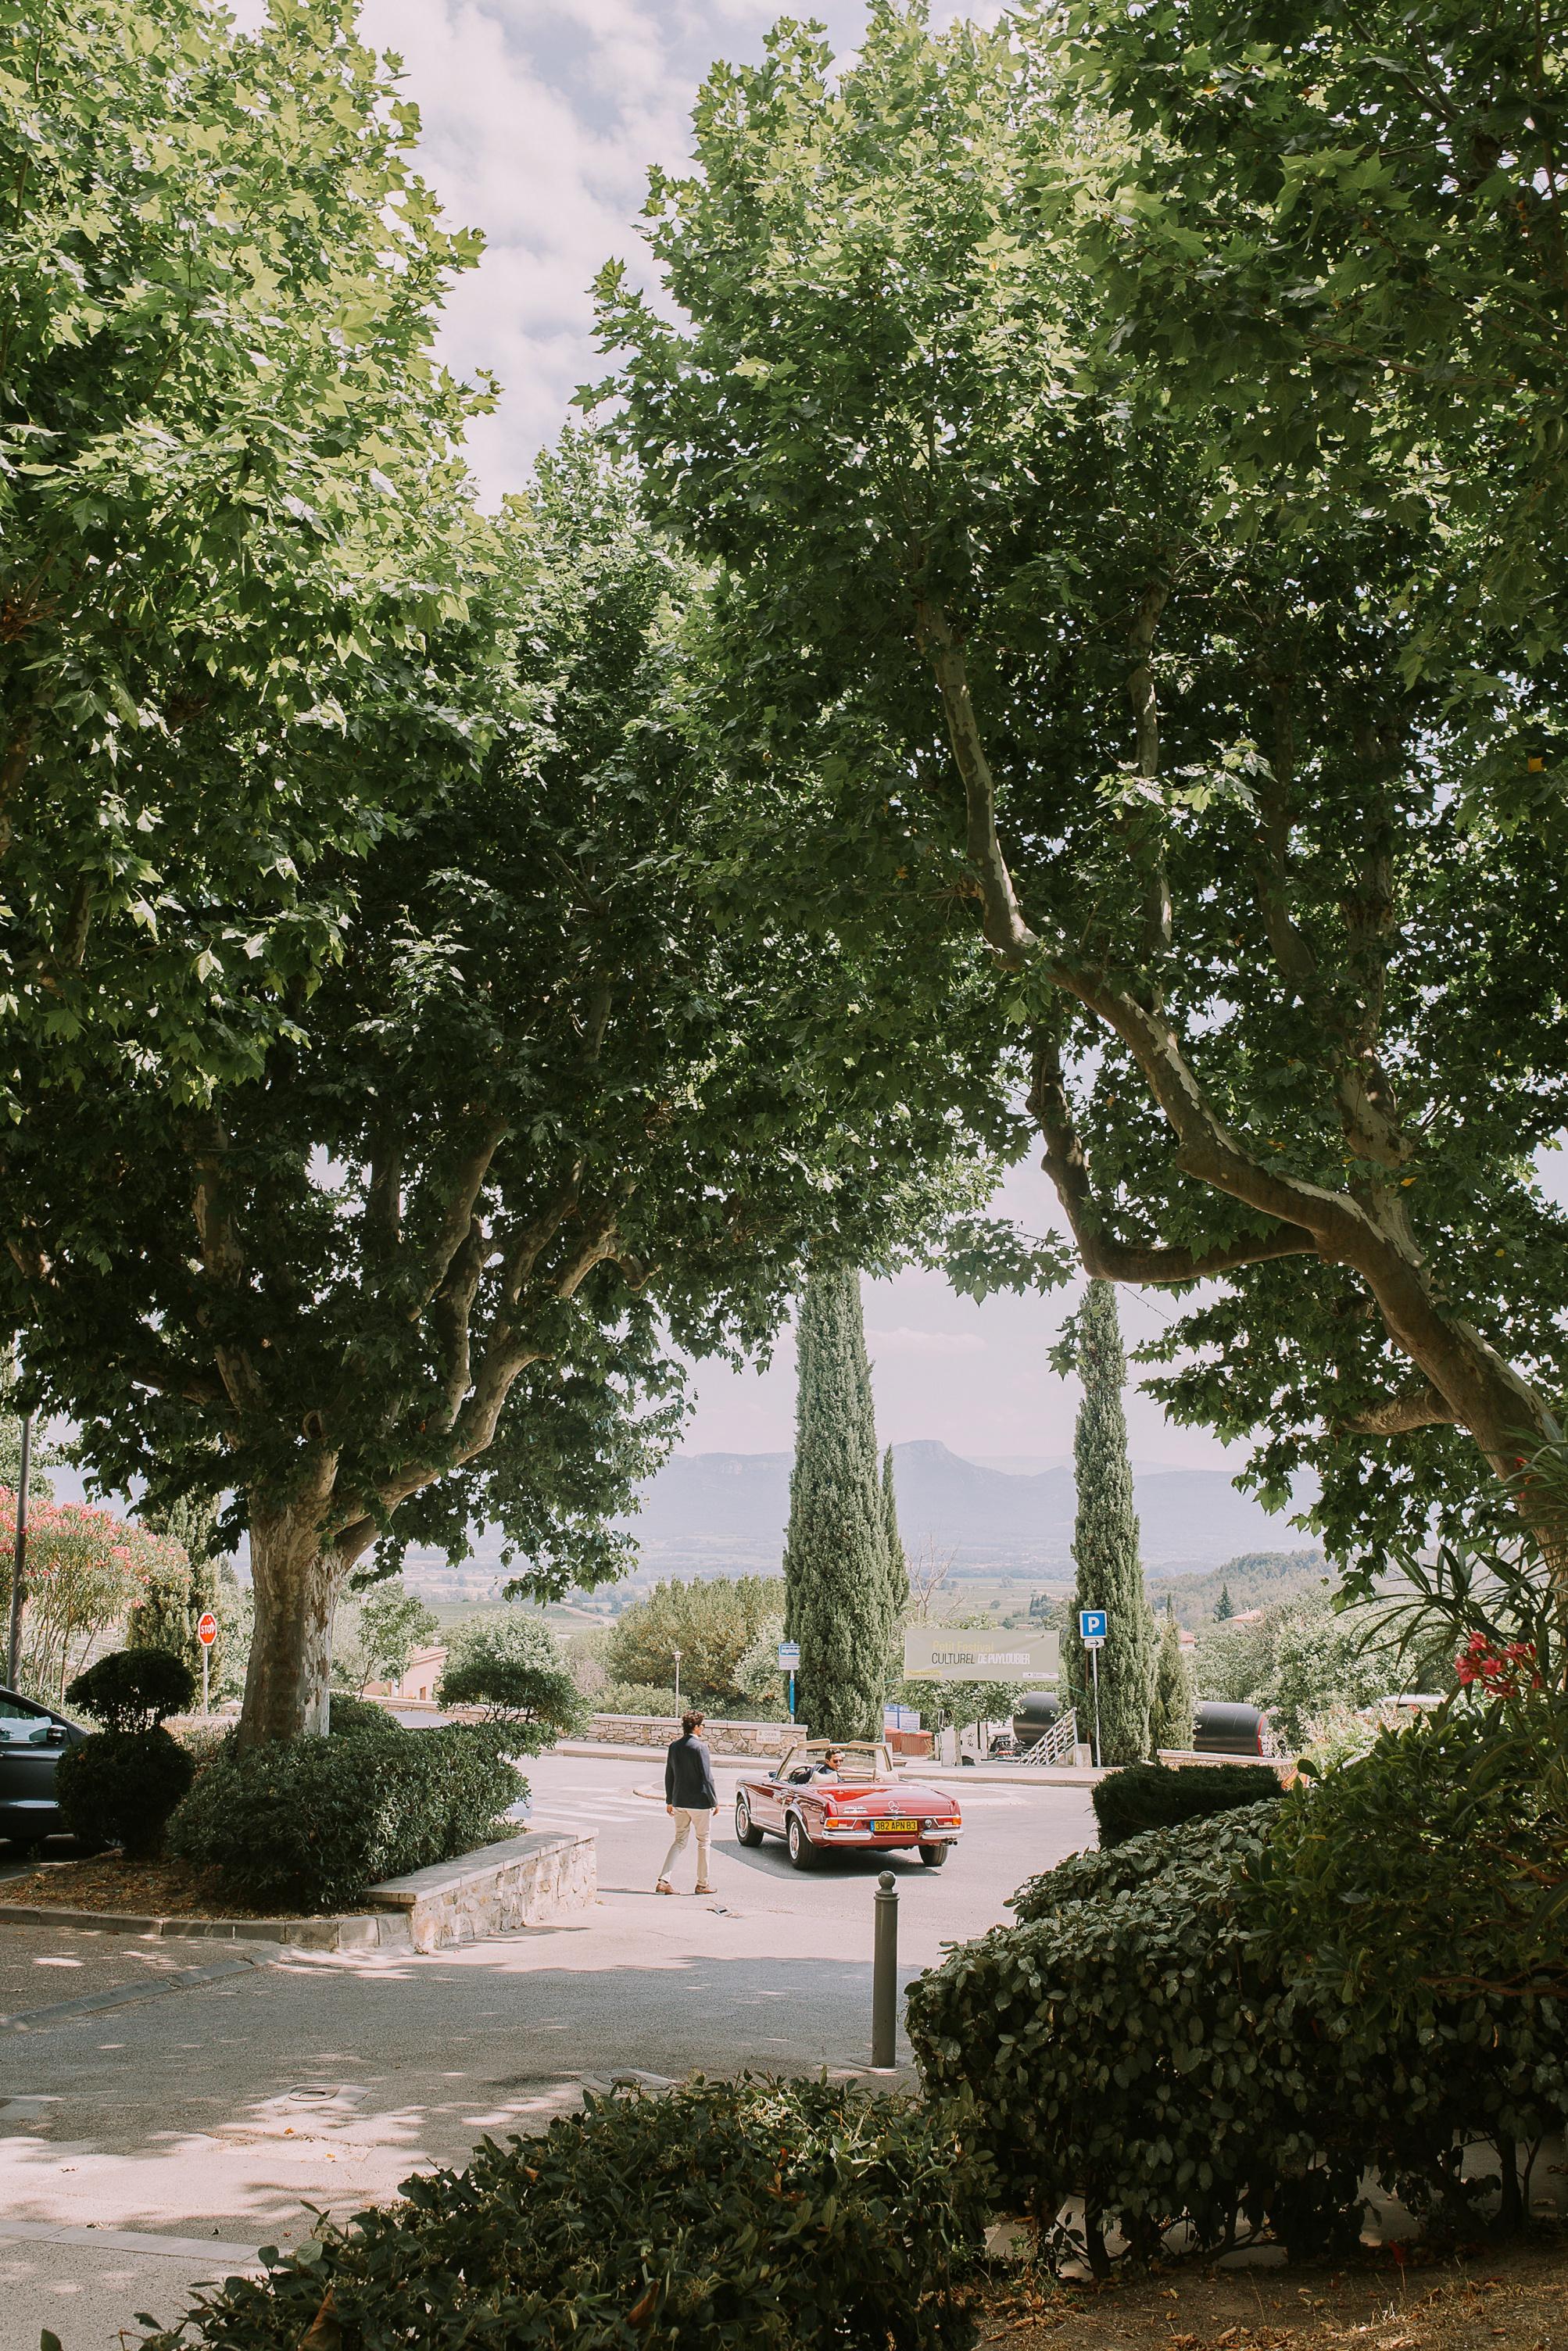 katerynaphotos-mariage-photographe-puyloubier-provence-aix-en-provence-sud-de-la-france_0348.jpg